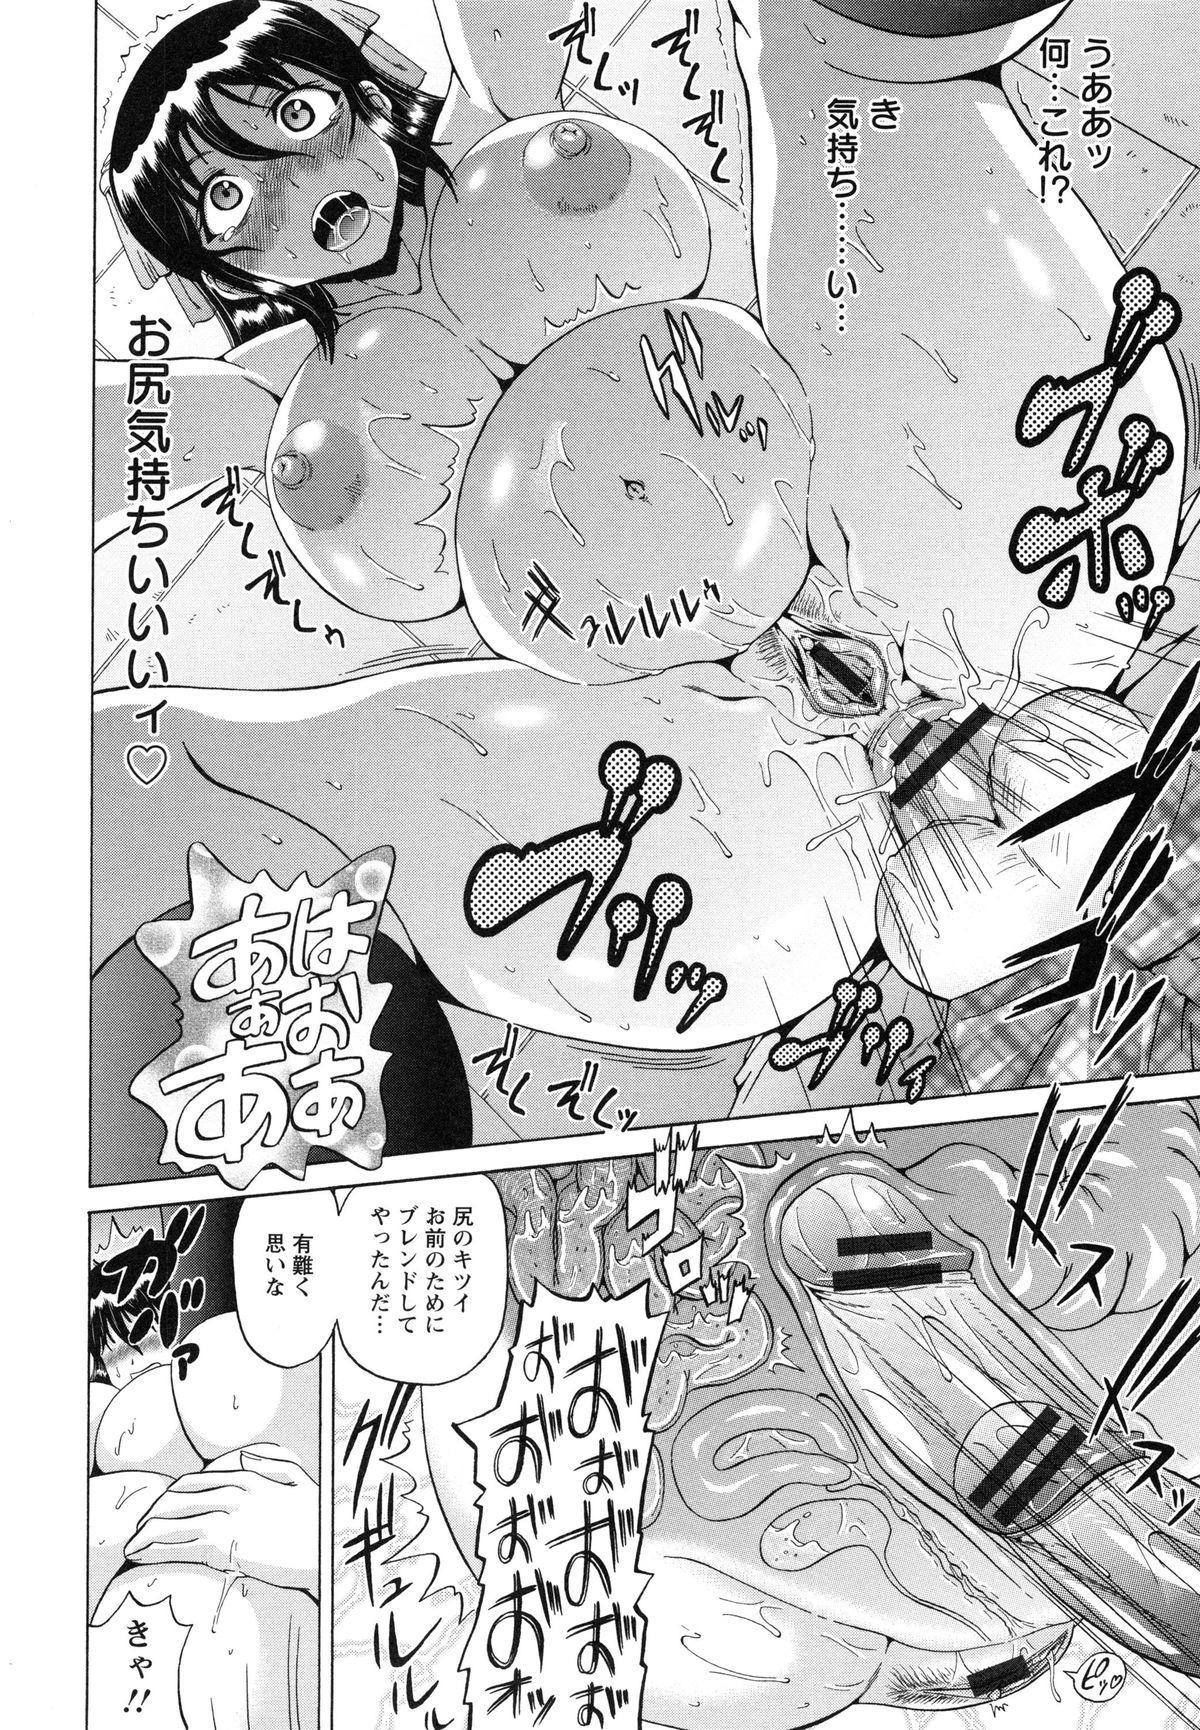 [Nukunuku Orange] Seikou ~Maeana Kanzen Houchi~ - Keep Anus in Anguish!!!! 151